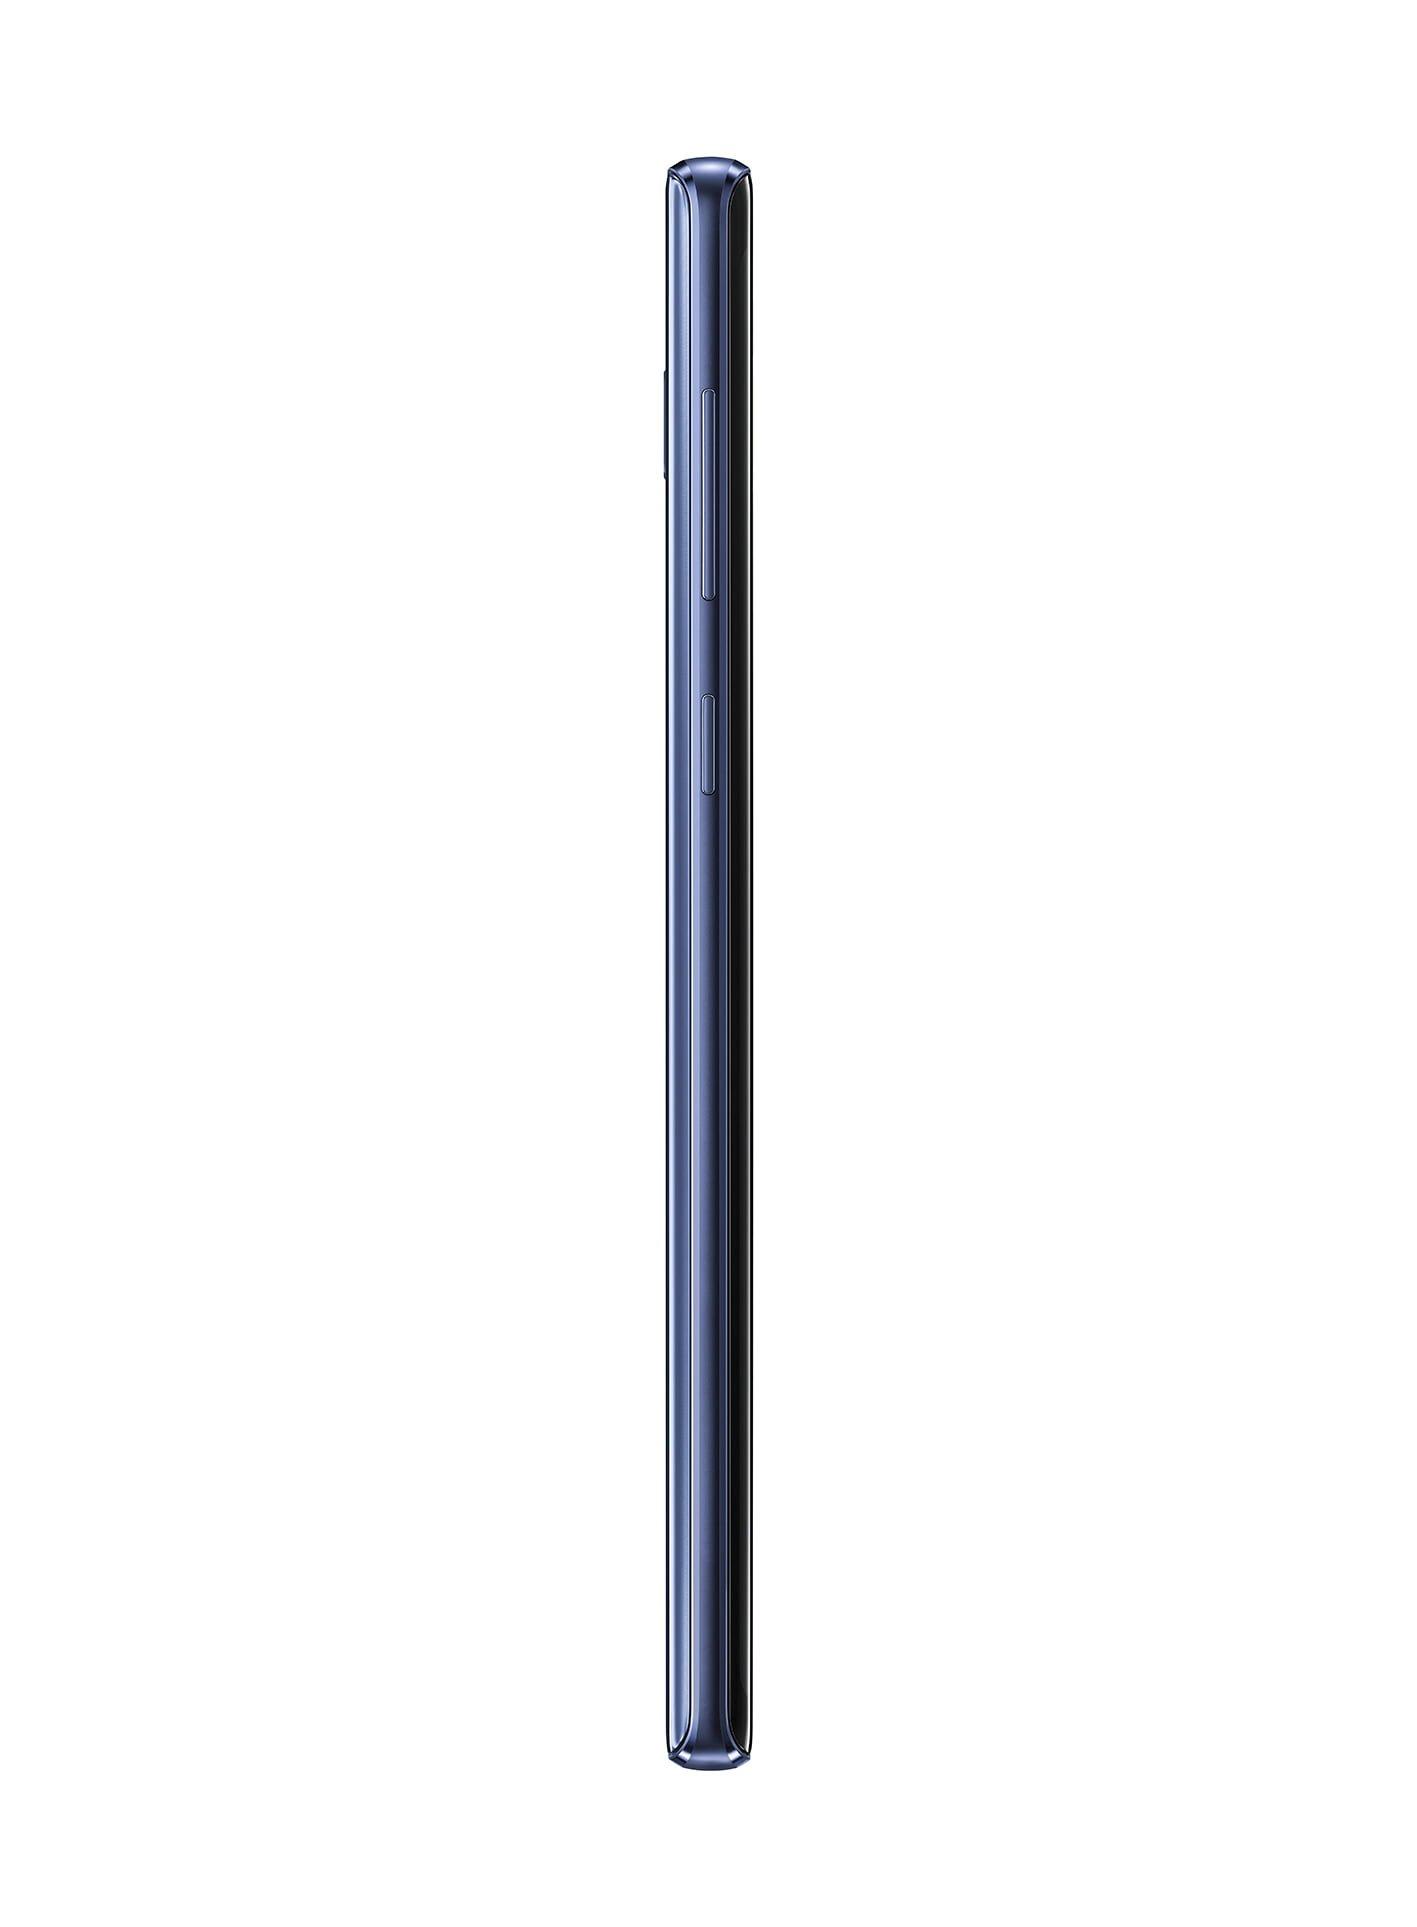 I Regali Di Samsung Per Festeggiare Tutti I Papà! 7 - Hynerd.it